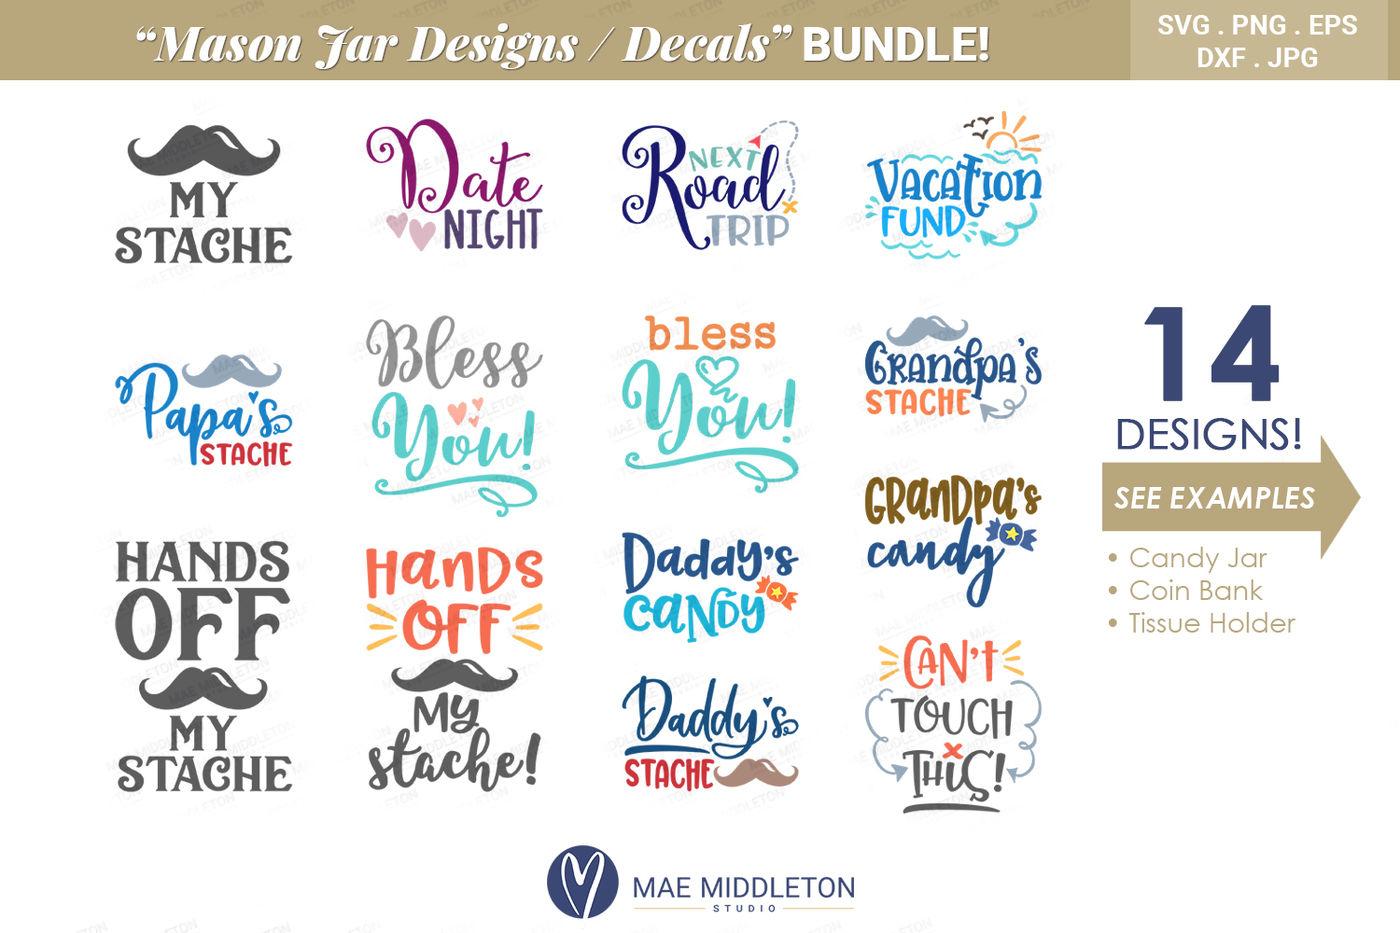 Mason Jar Designs Decals Printable Labels Bundle By Mae